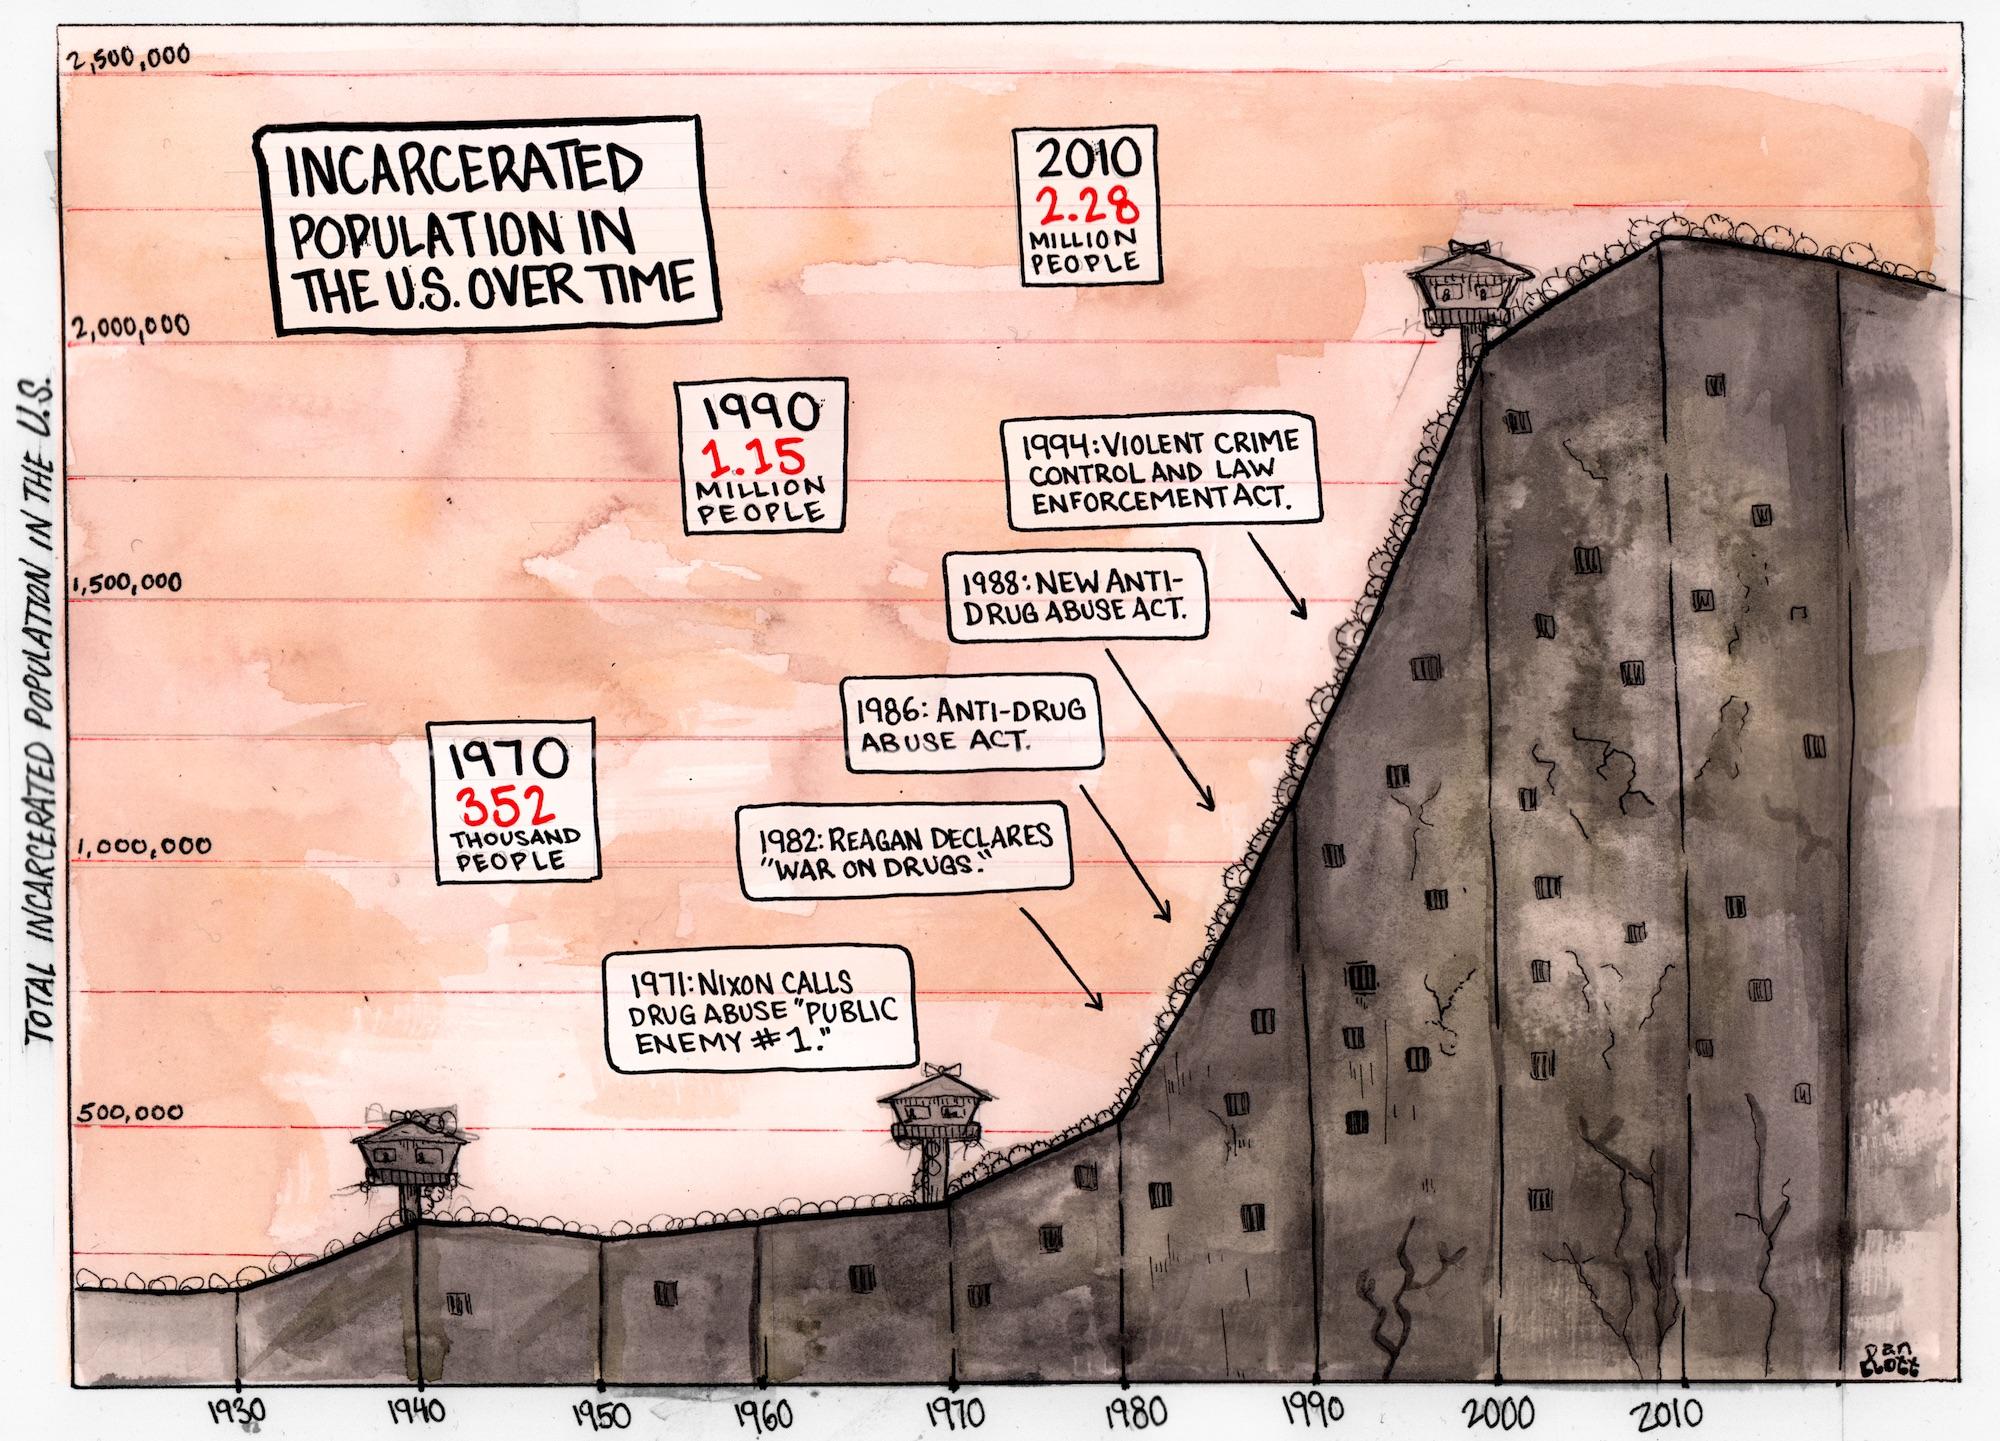 Mass incarceration timeline